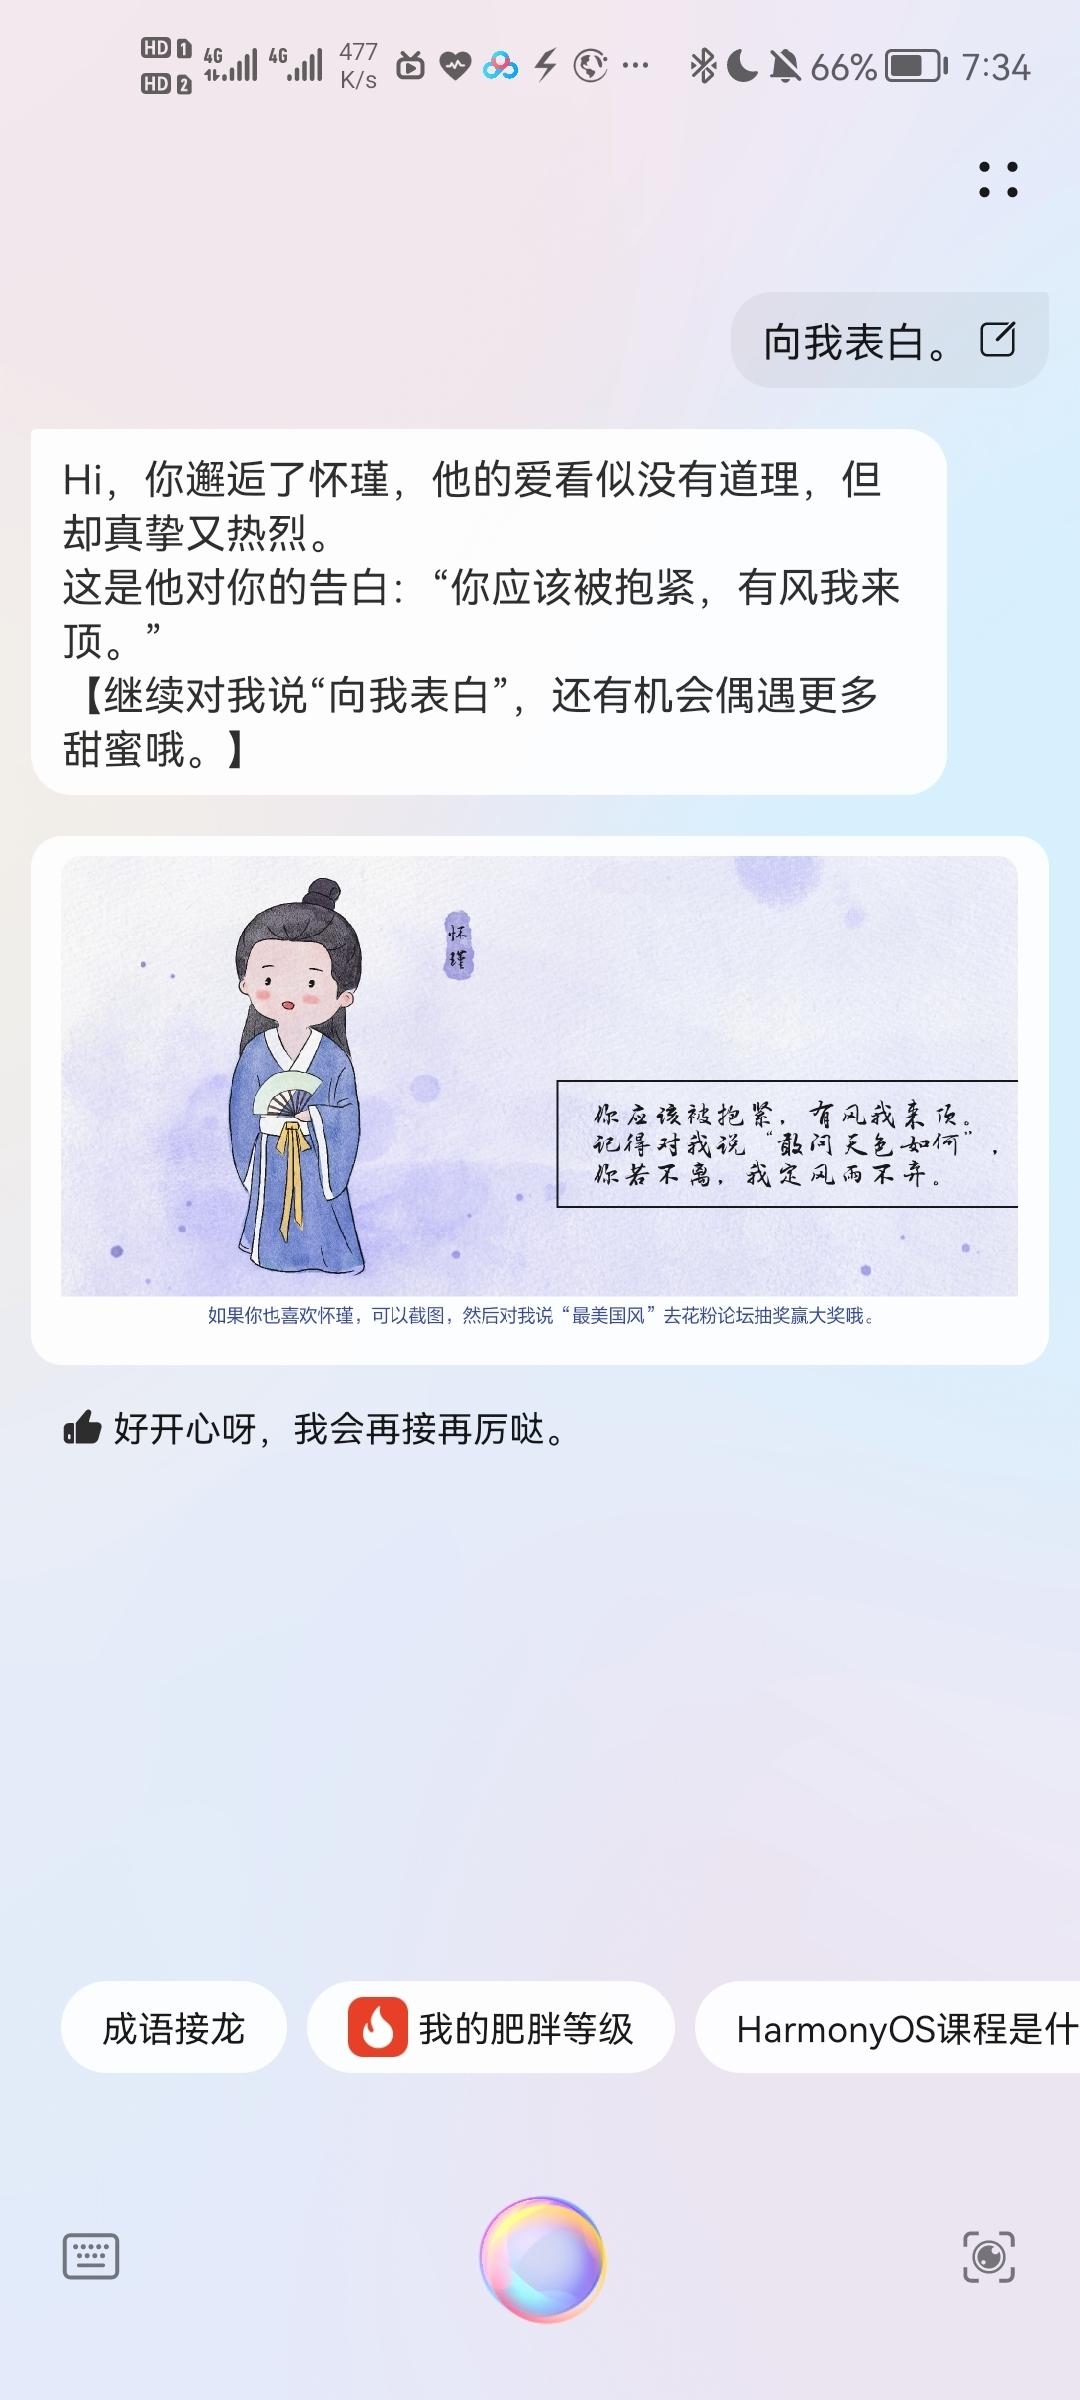 Screenshot_20210611_193445_com.huawei.vassistant.jpg